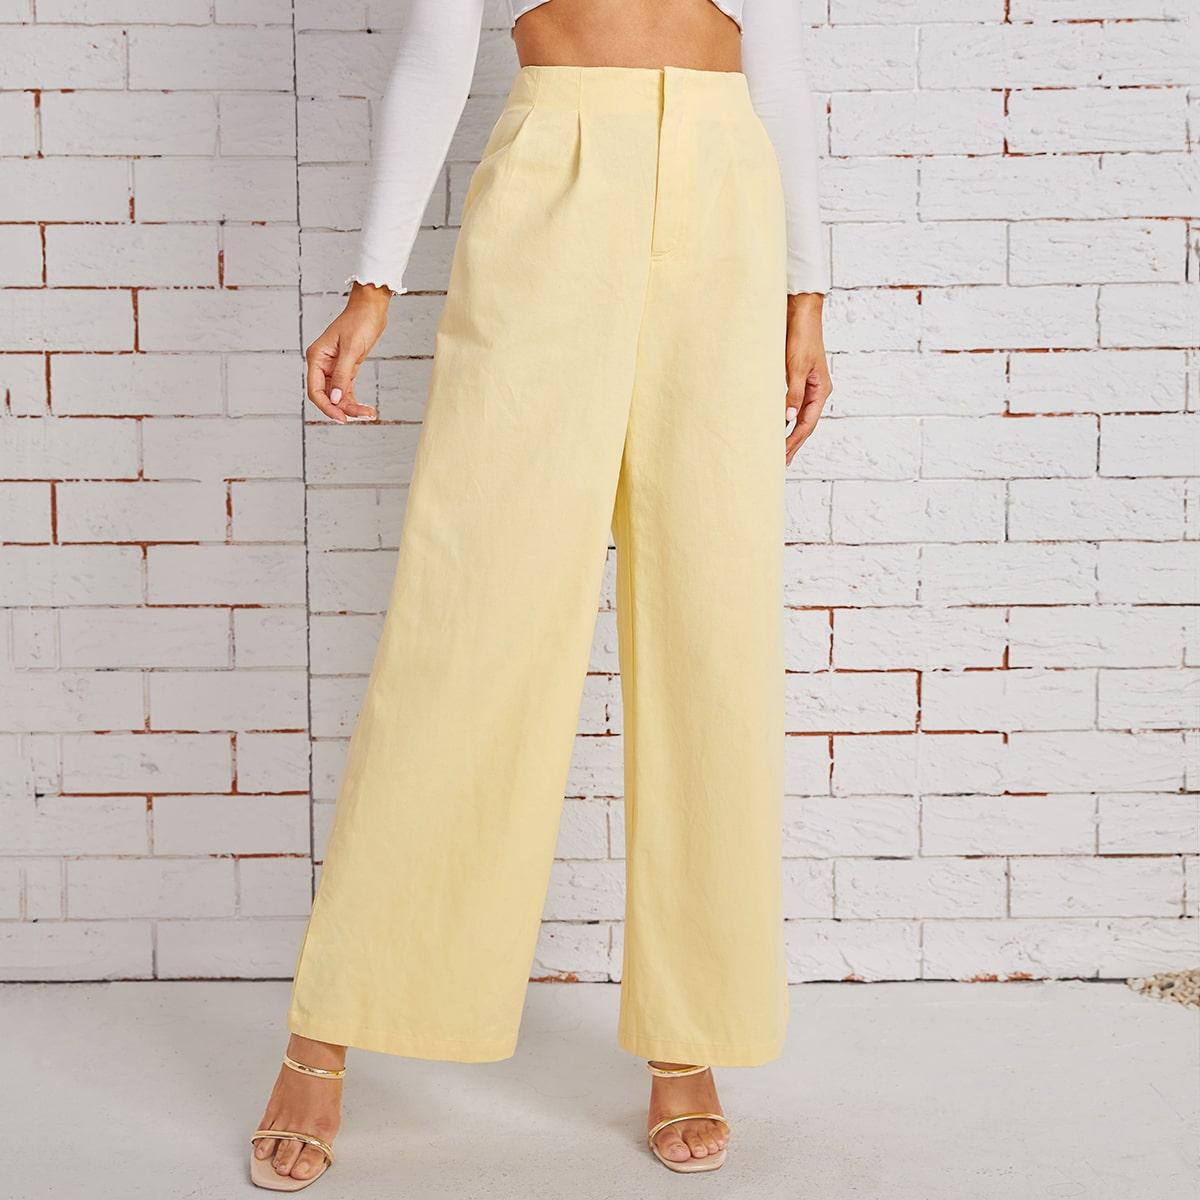 100% COTTON High Waist Fold Pleat Wide Leg Pants